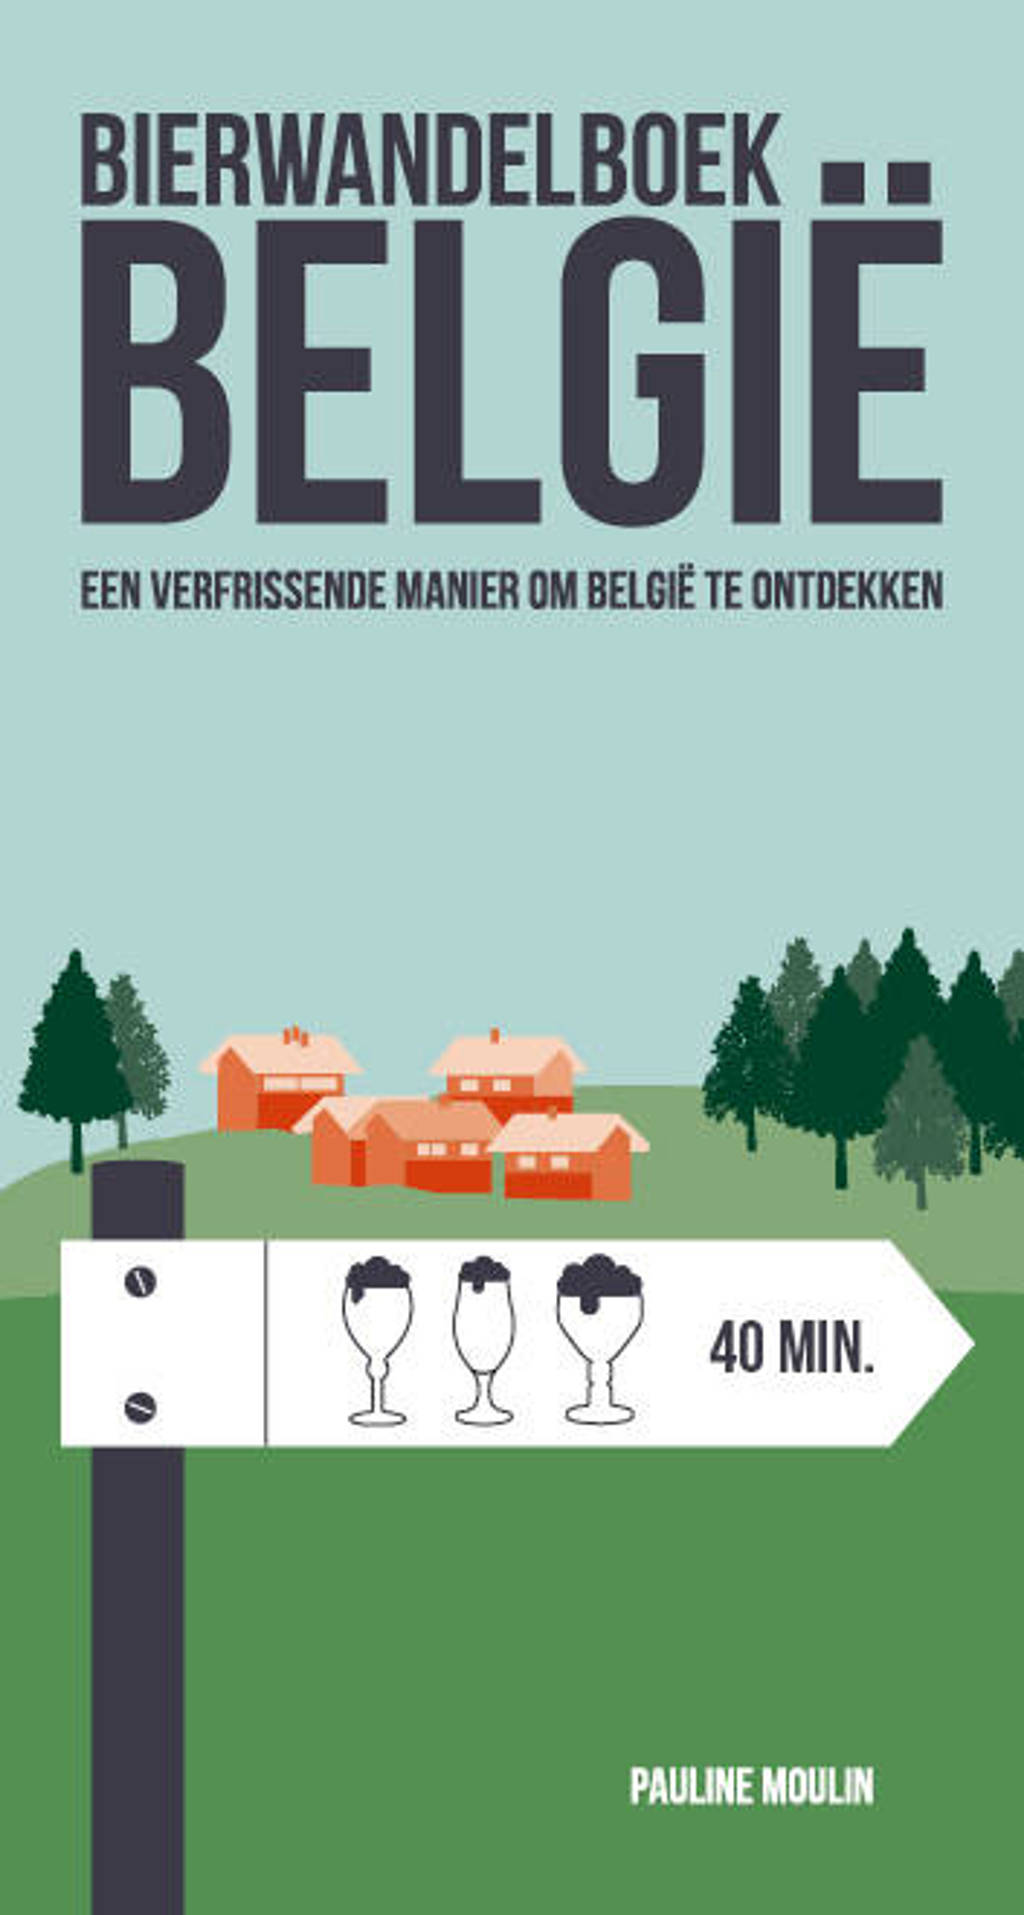 Bierwandelboek België - Pauline Moulin